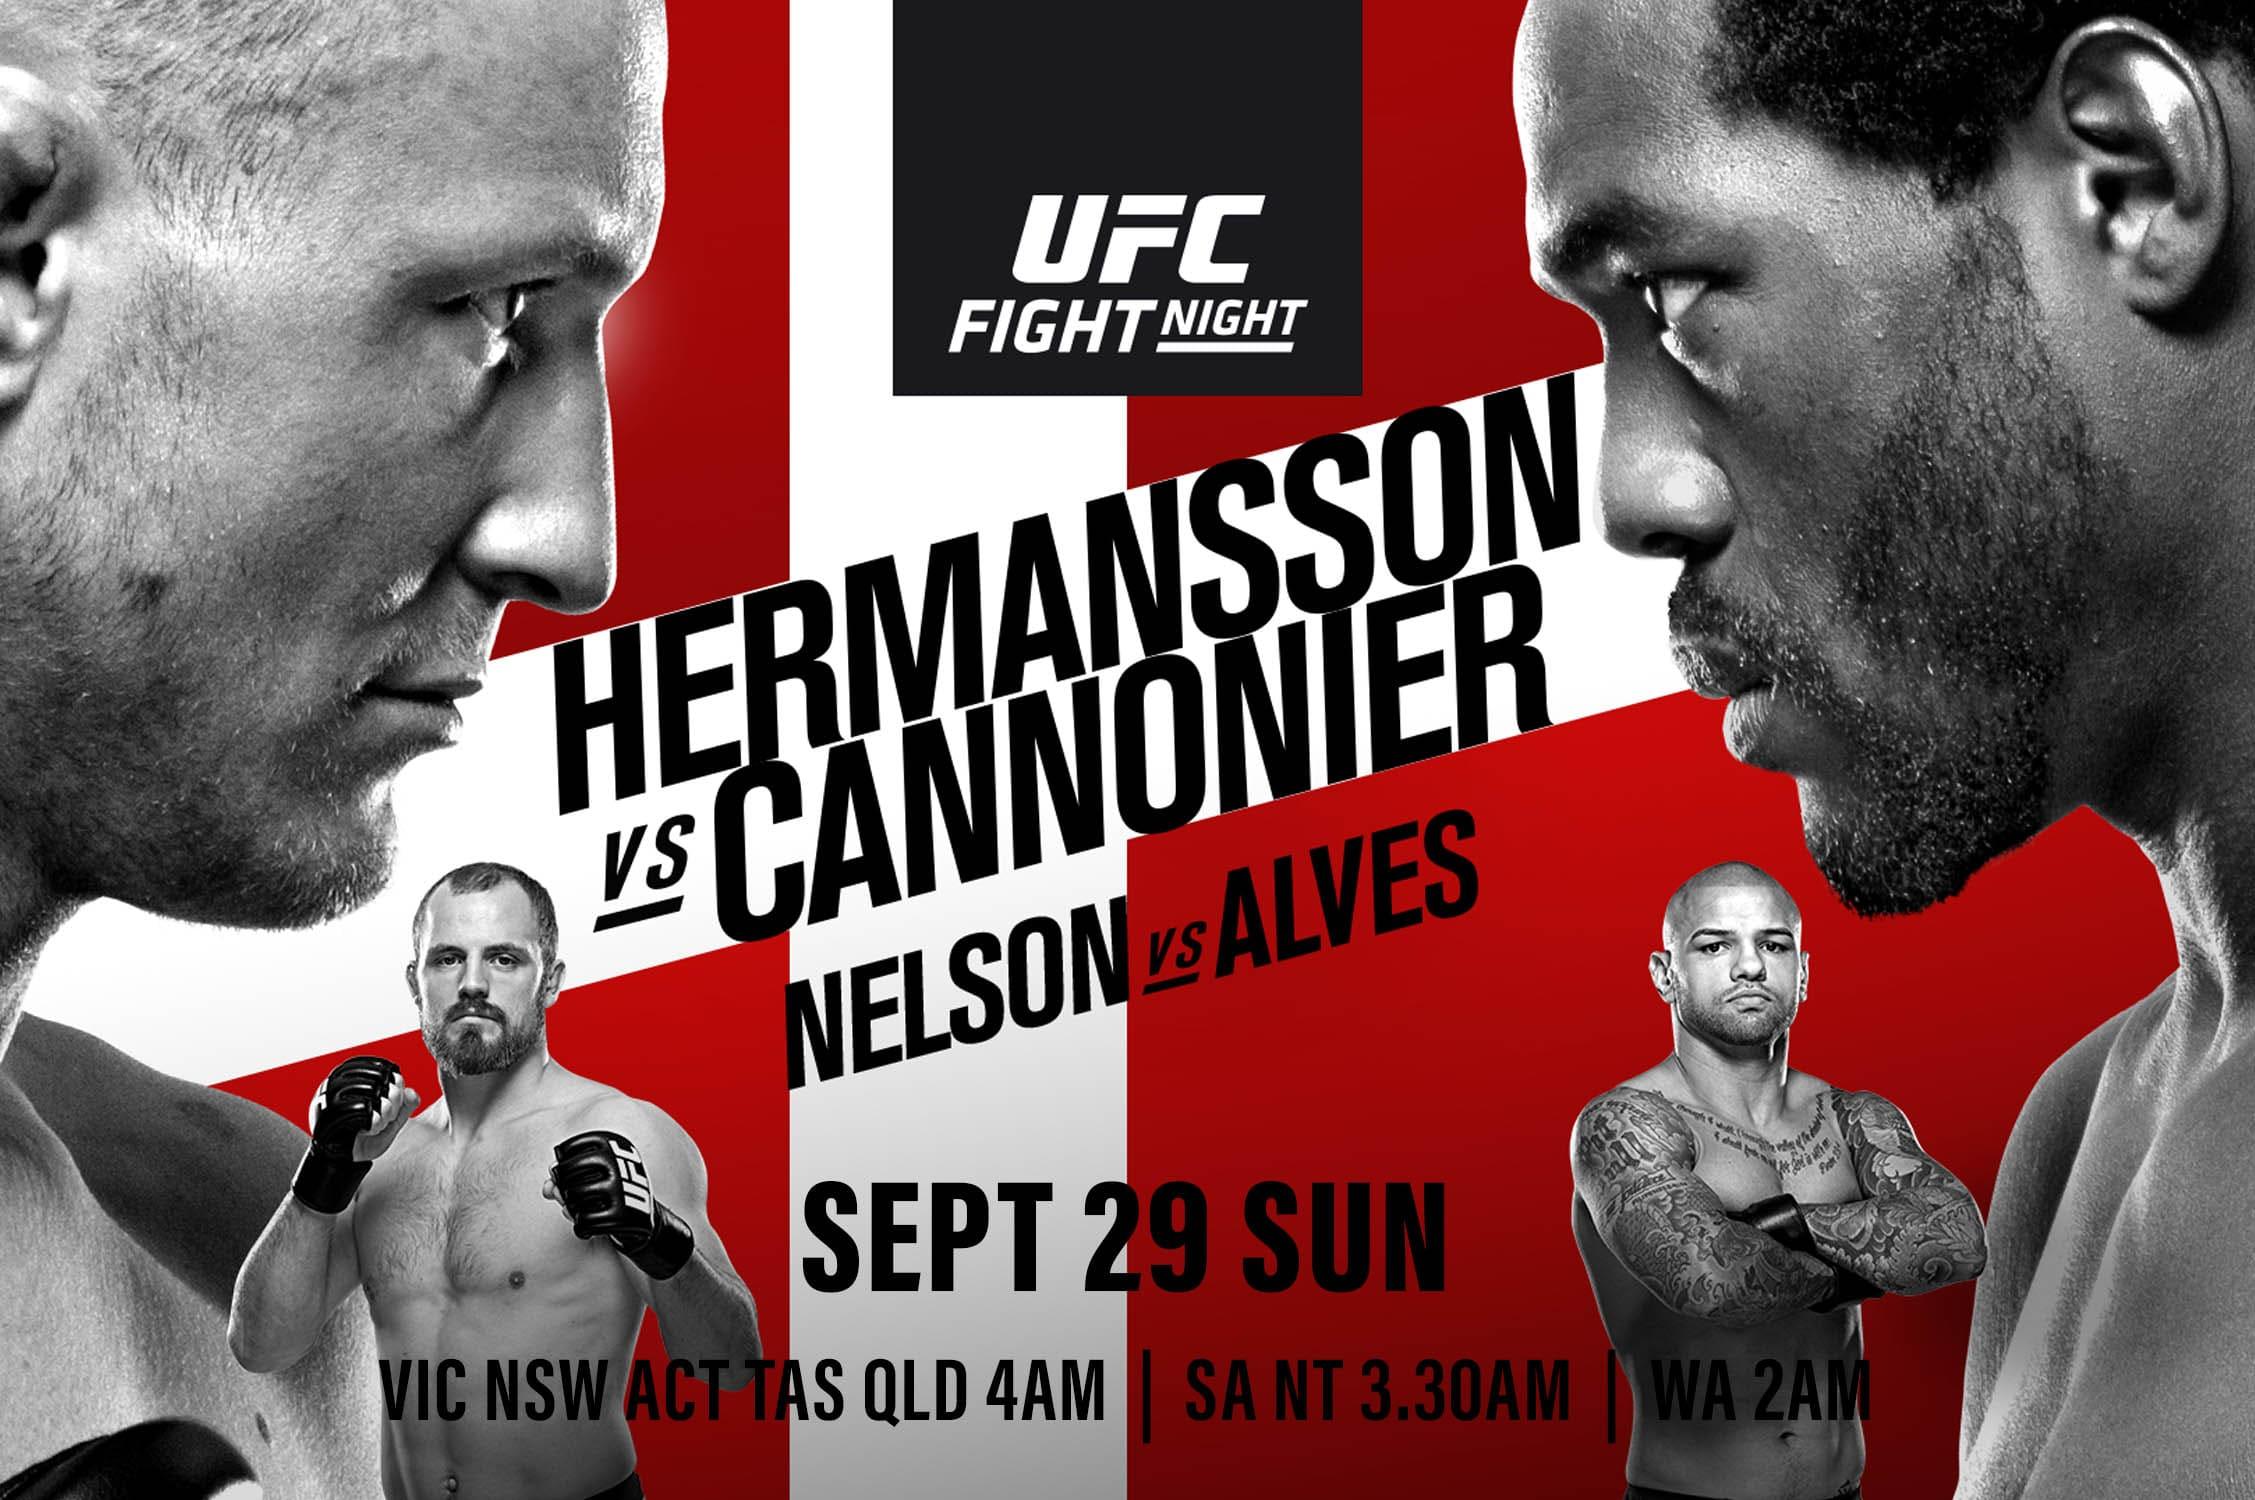 UFC Fight Night Hermansson vs Cannonier_Sept 29_BATP-min.jpg